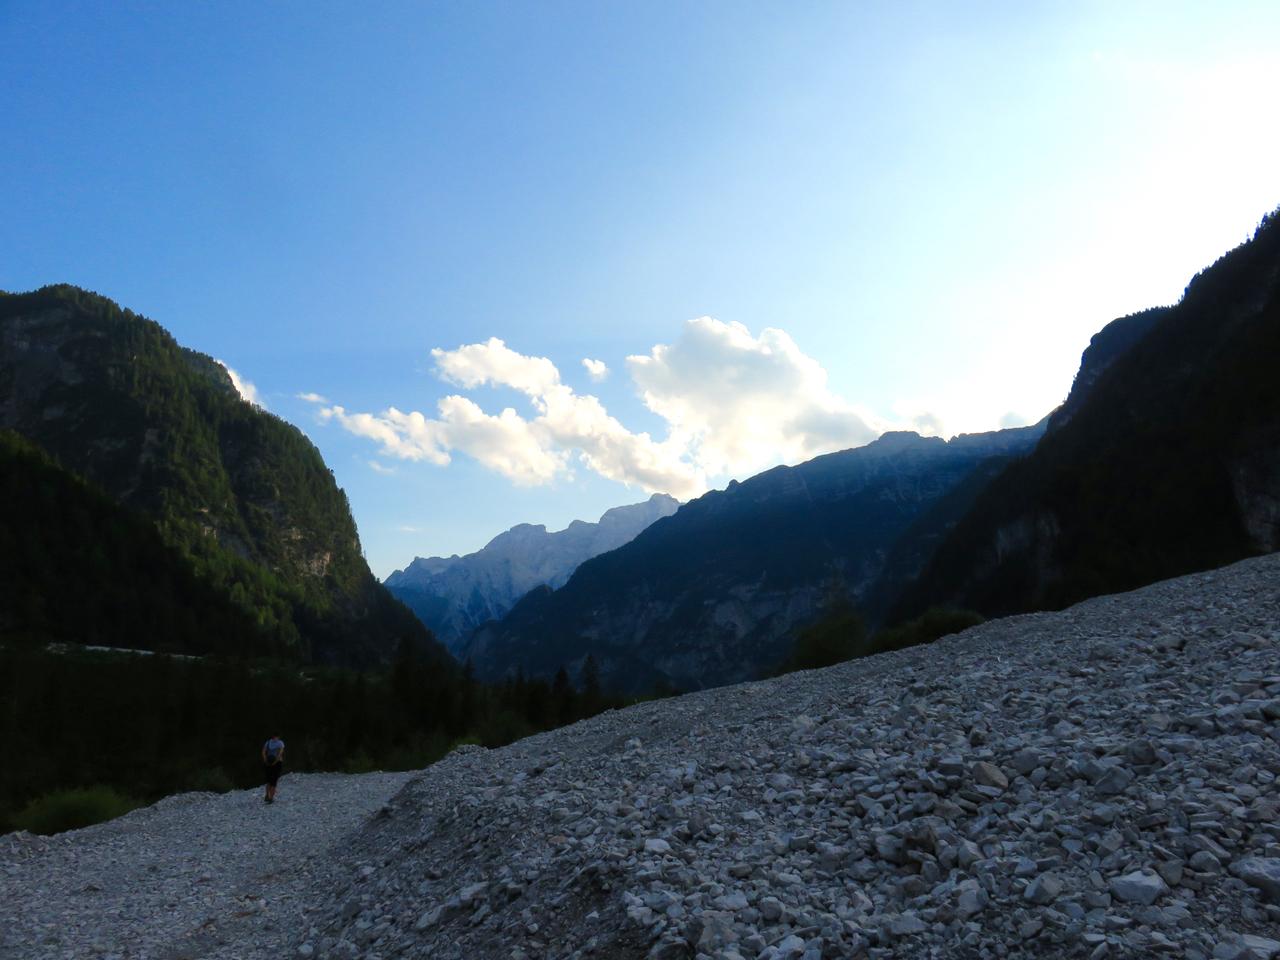 friulevolution, freeuliamo, Friuli-Venezia Giulia, Val Cellina, Dolomiti Friulane, Dolomites, Val Cimoliana, Parco Dolomiti Friulane, wilderness